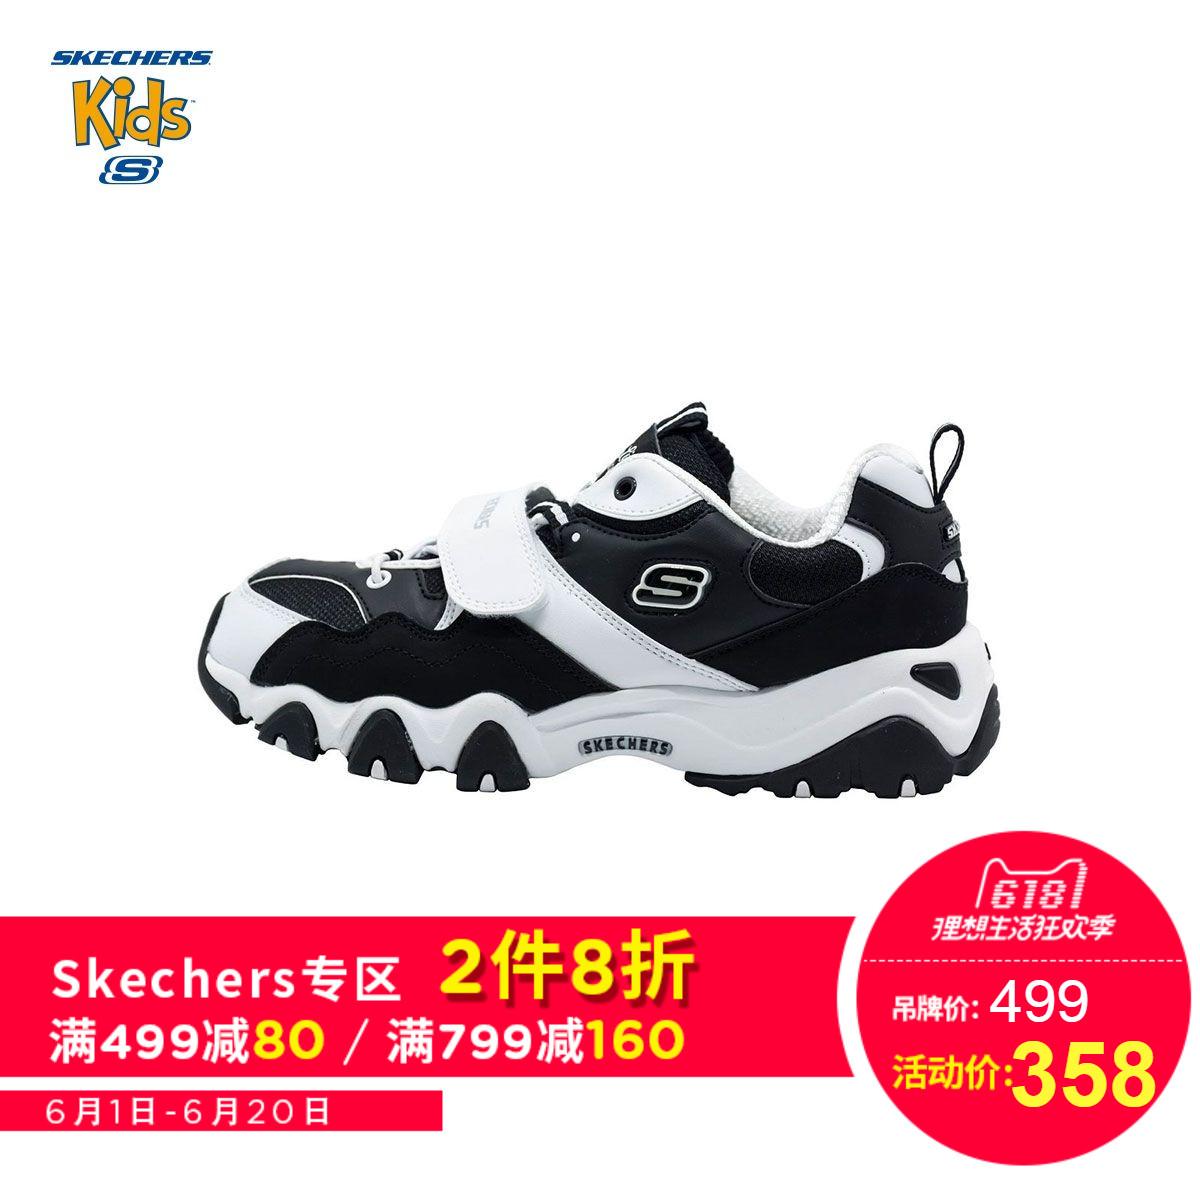 skechers/斯凯奇儿童中大童休闲鞋D LITES II 魔术贴运动鞋8-14岁